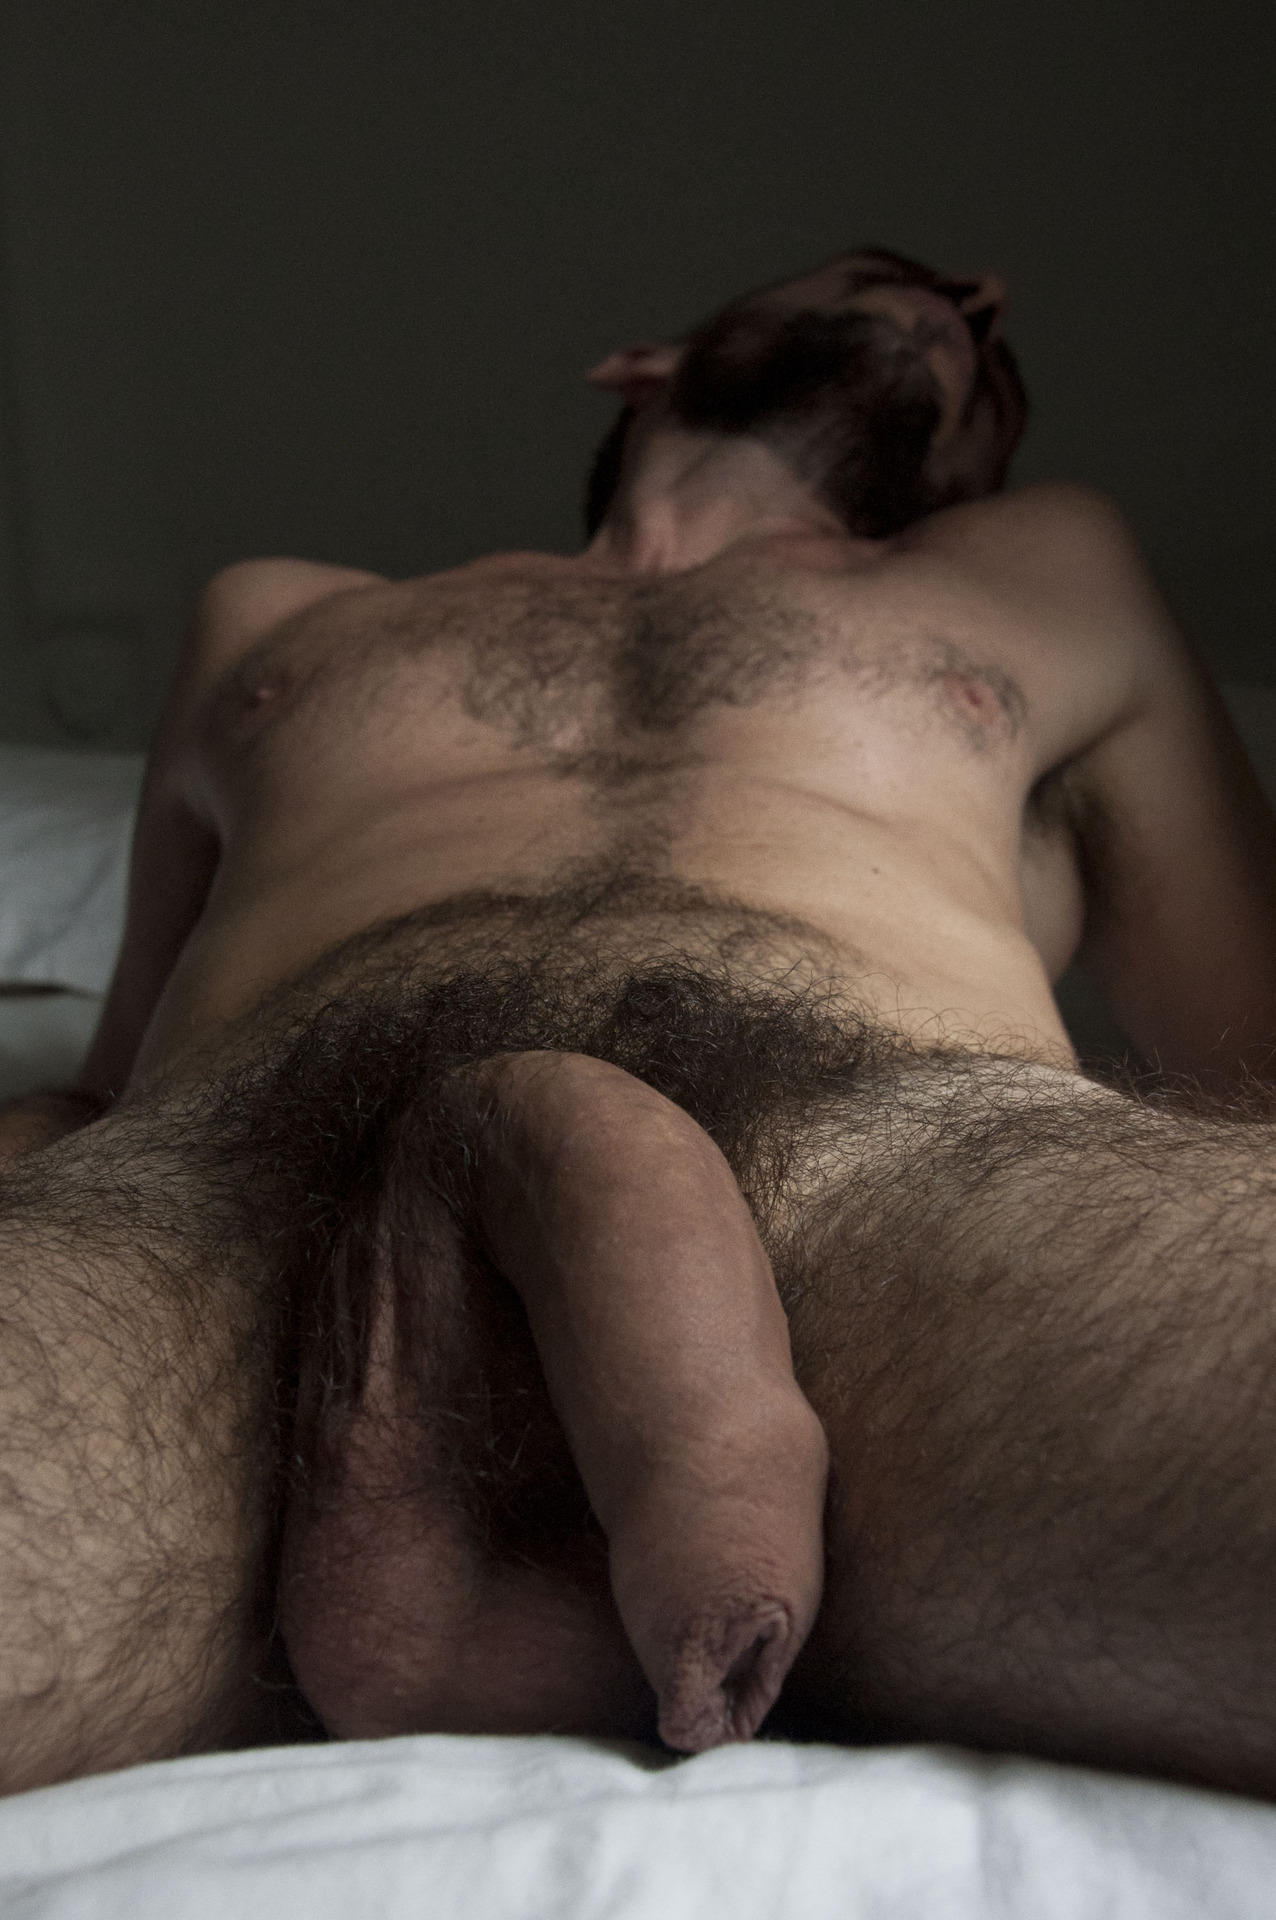 Porn tube Ozzy from survivor